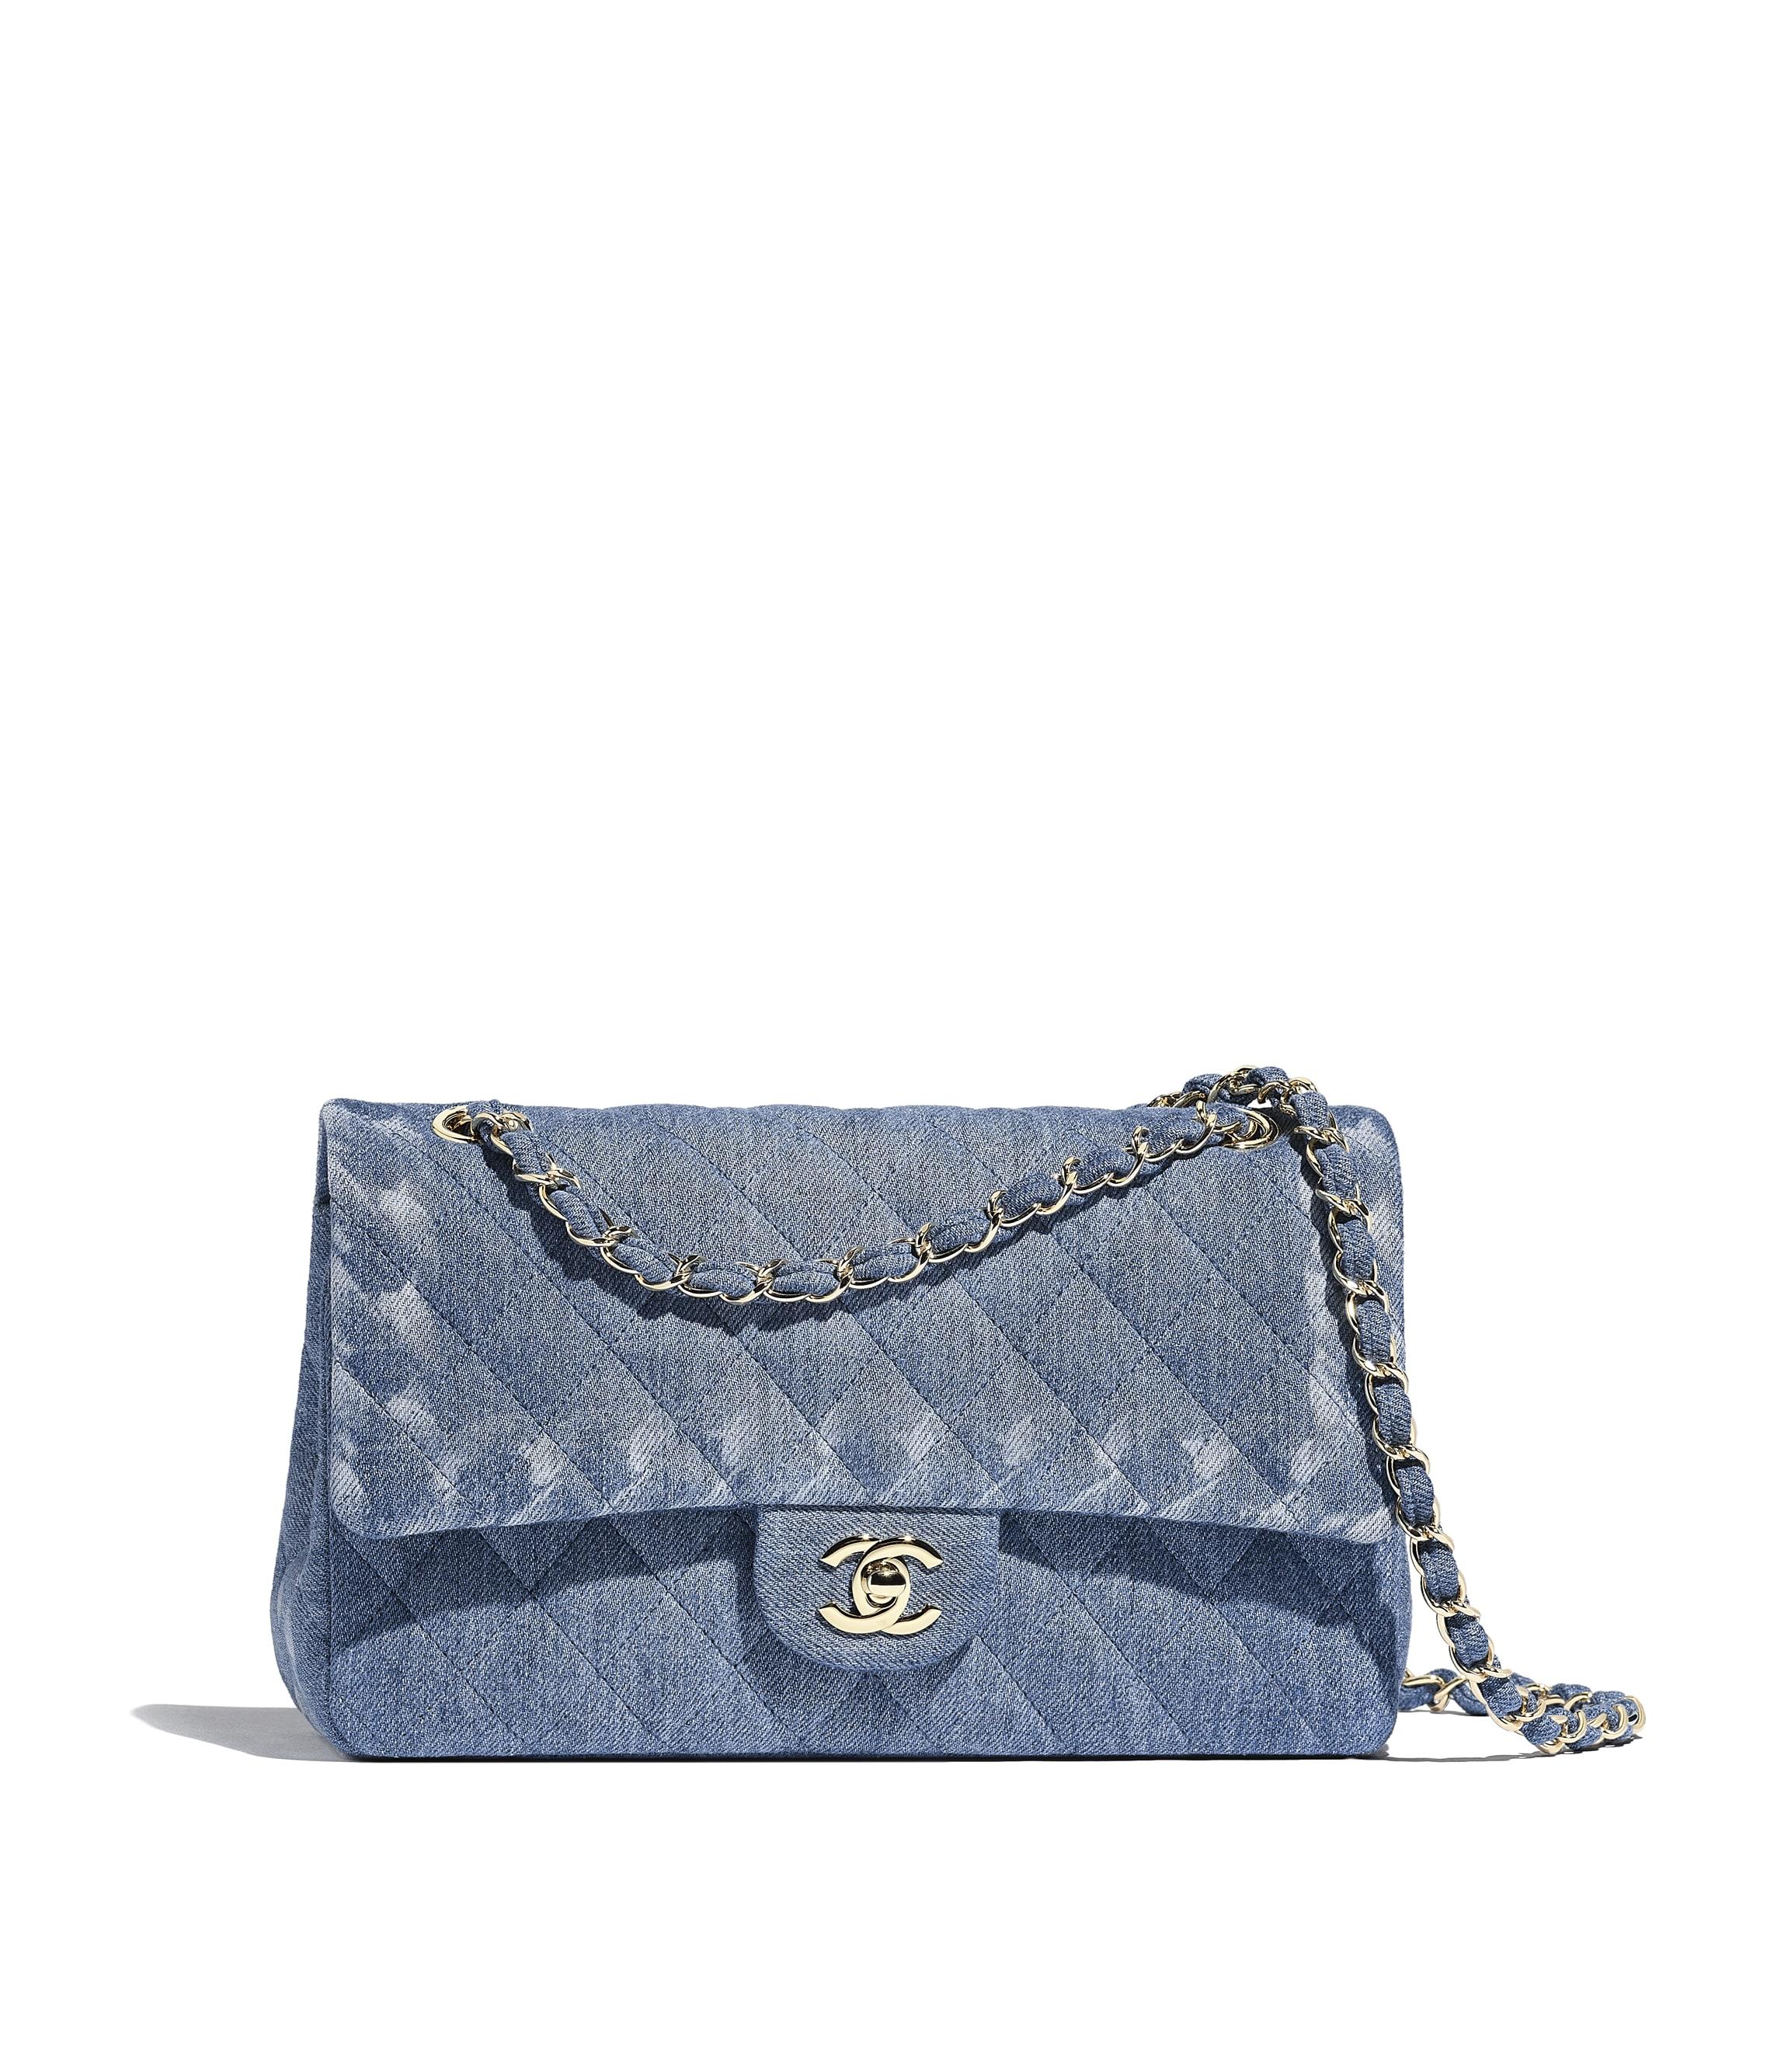 c721570f61ba Classic Handbags - Handbags - CHANEL